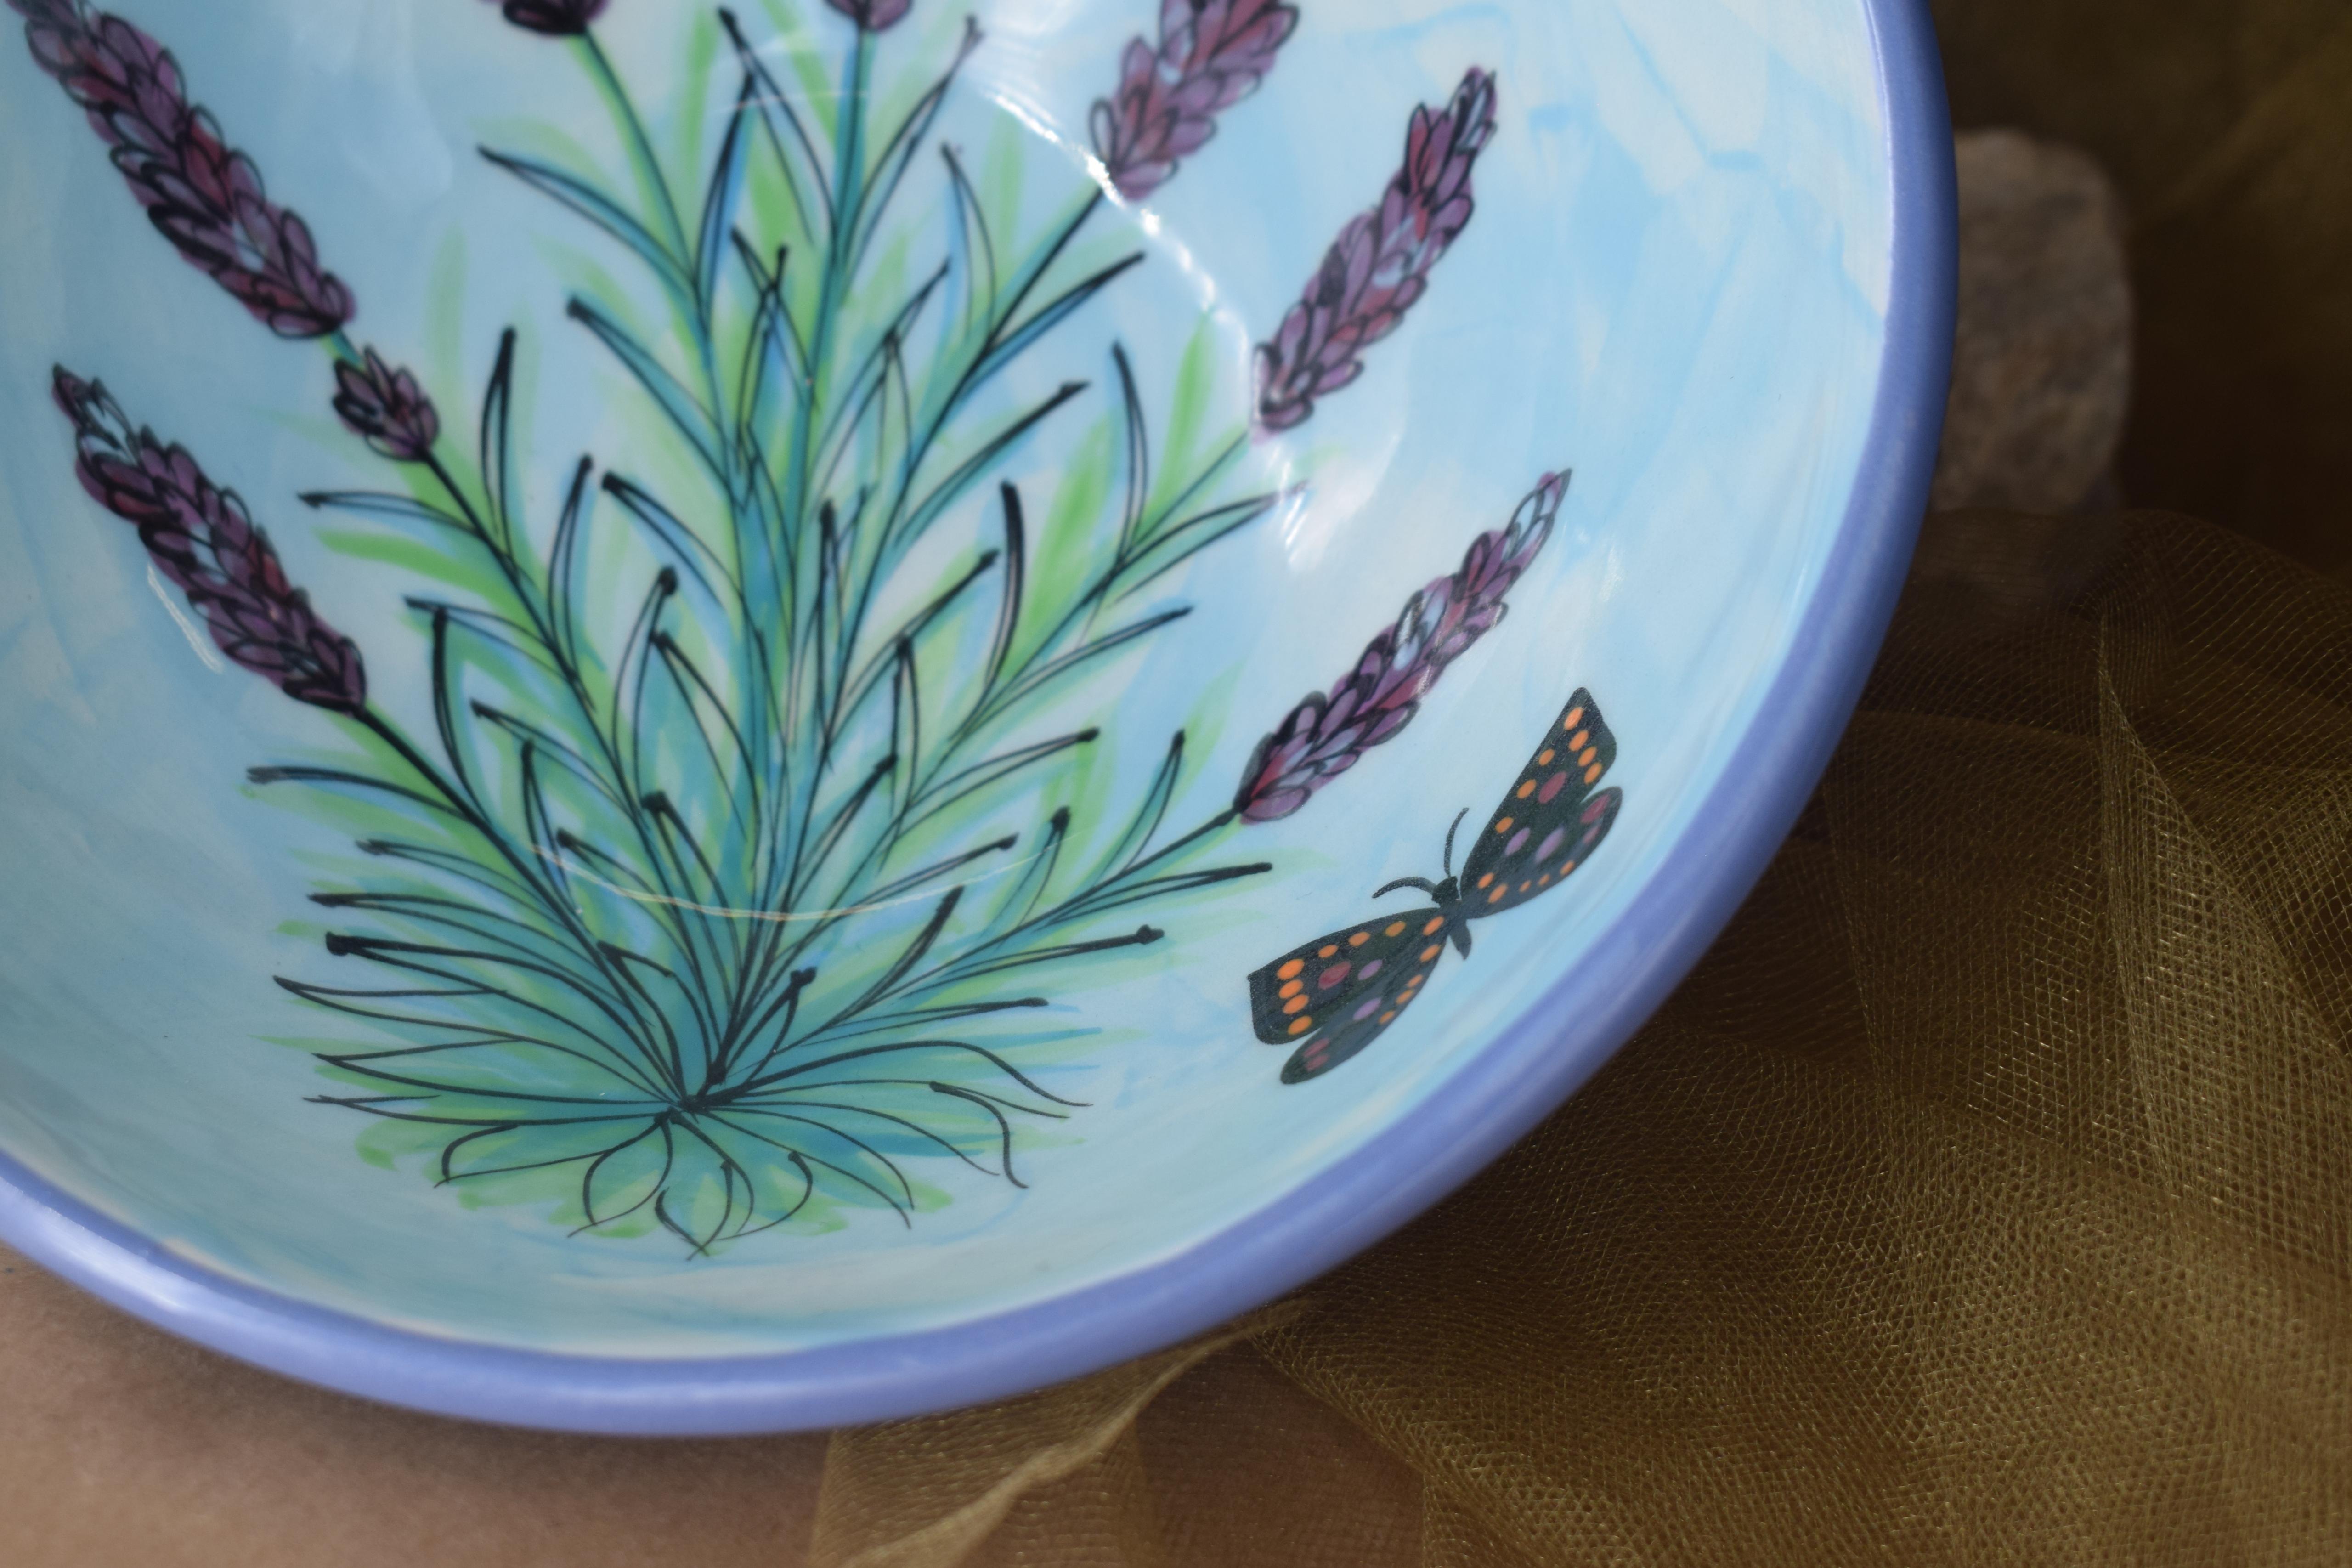 "(FRB7-EL) 7"" Footed Round Bowl- English Lavender"